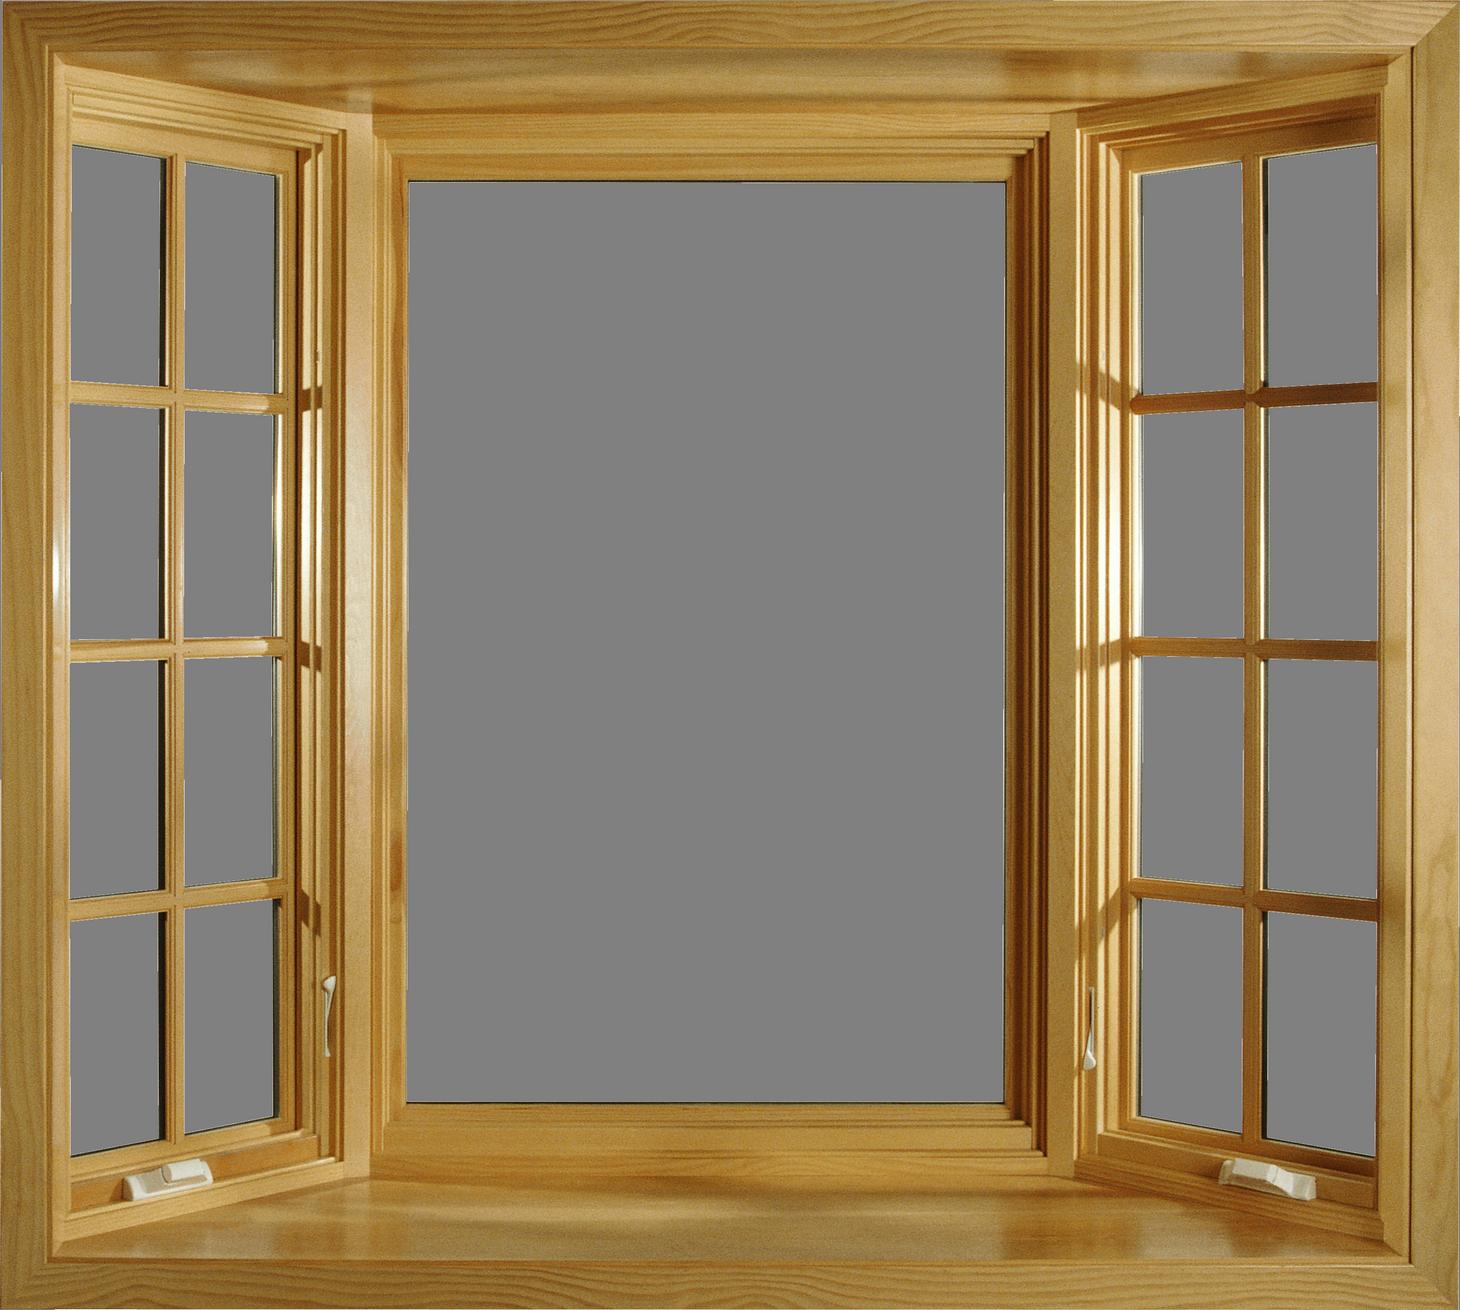 Window Fundo Para Fotos Janelas Molduras